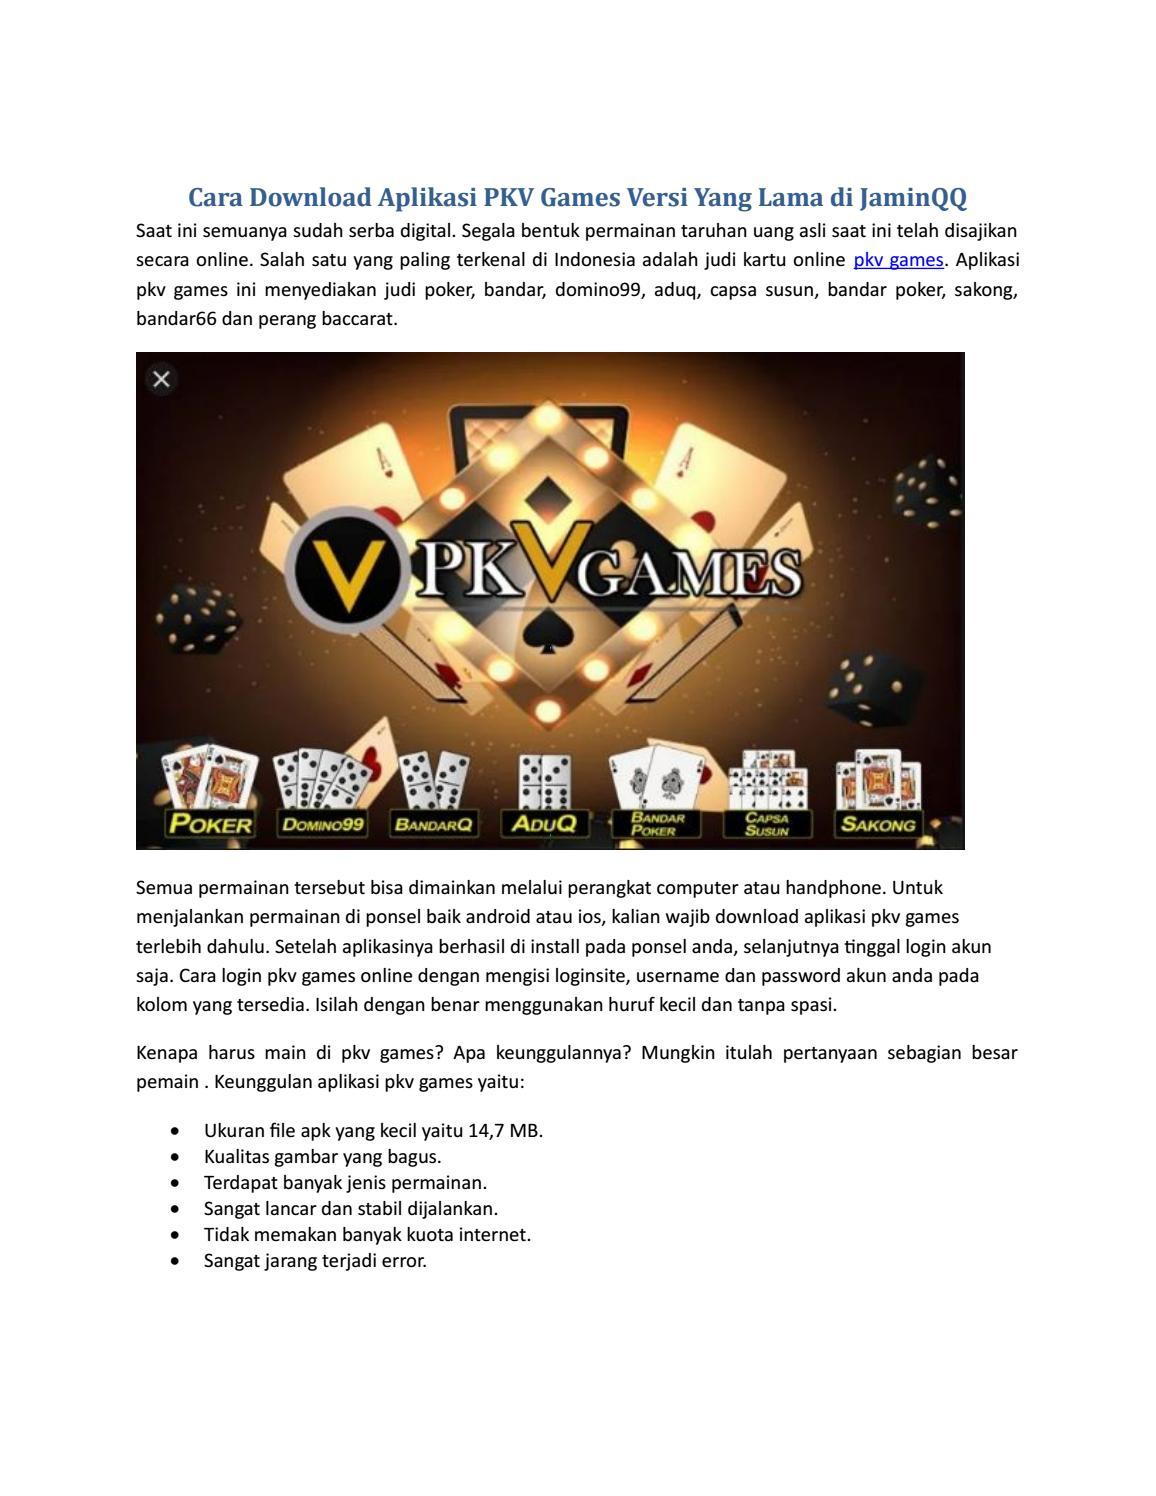 Cara Download Aplikasi Pkv Games Versi Lama By Phuc An Issuu